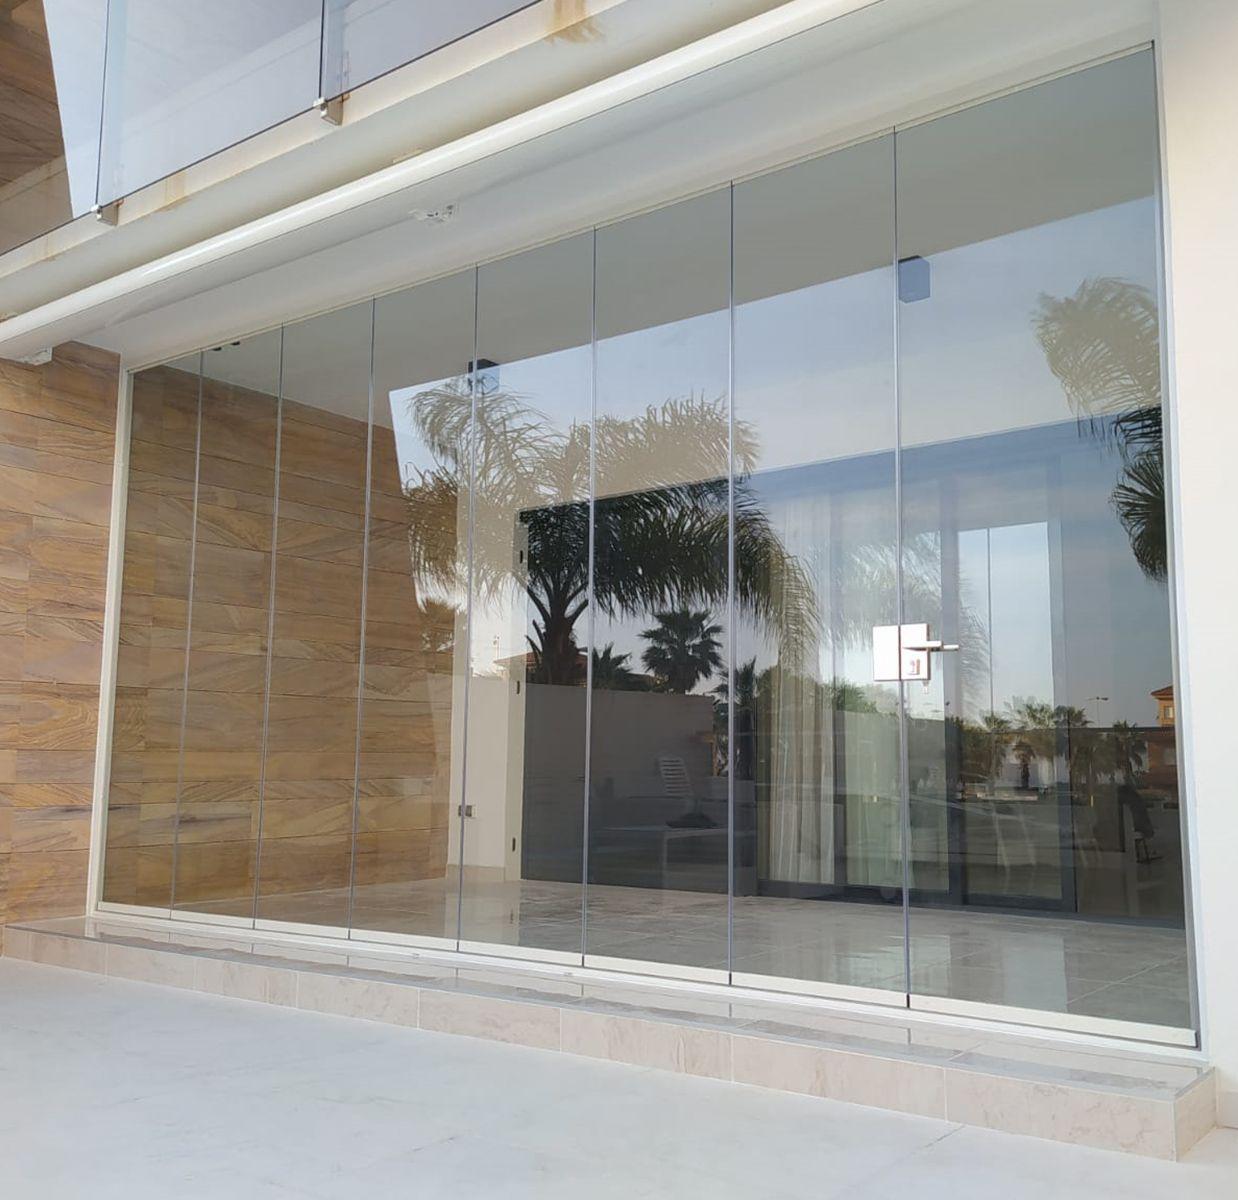 Entrada de cortina corredera con fija lateral